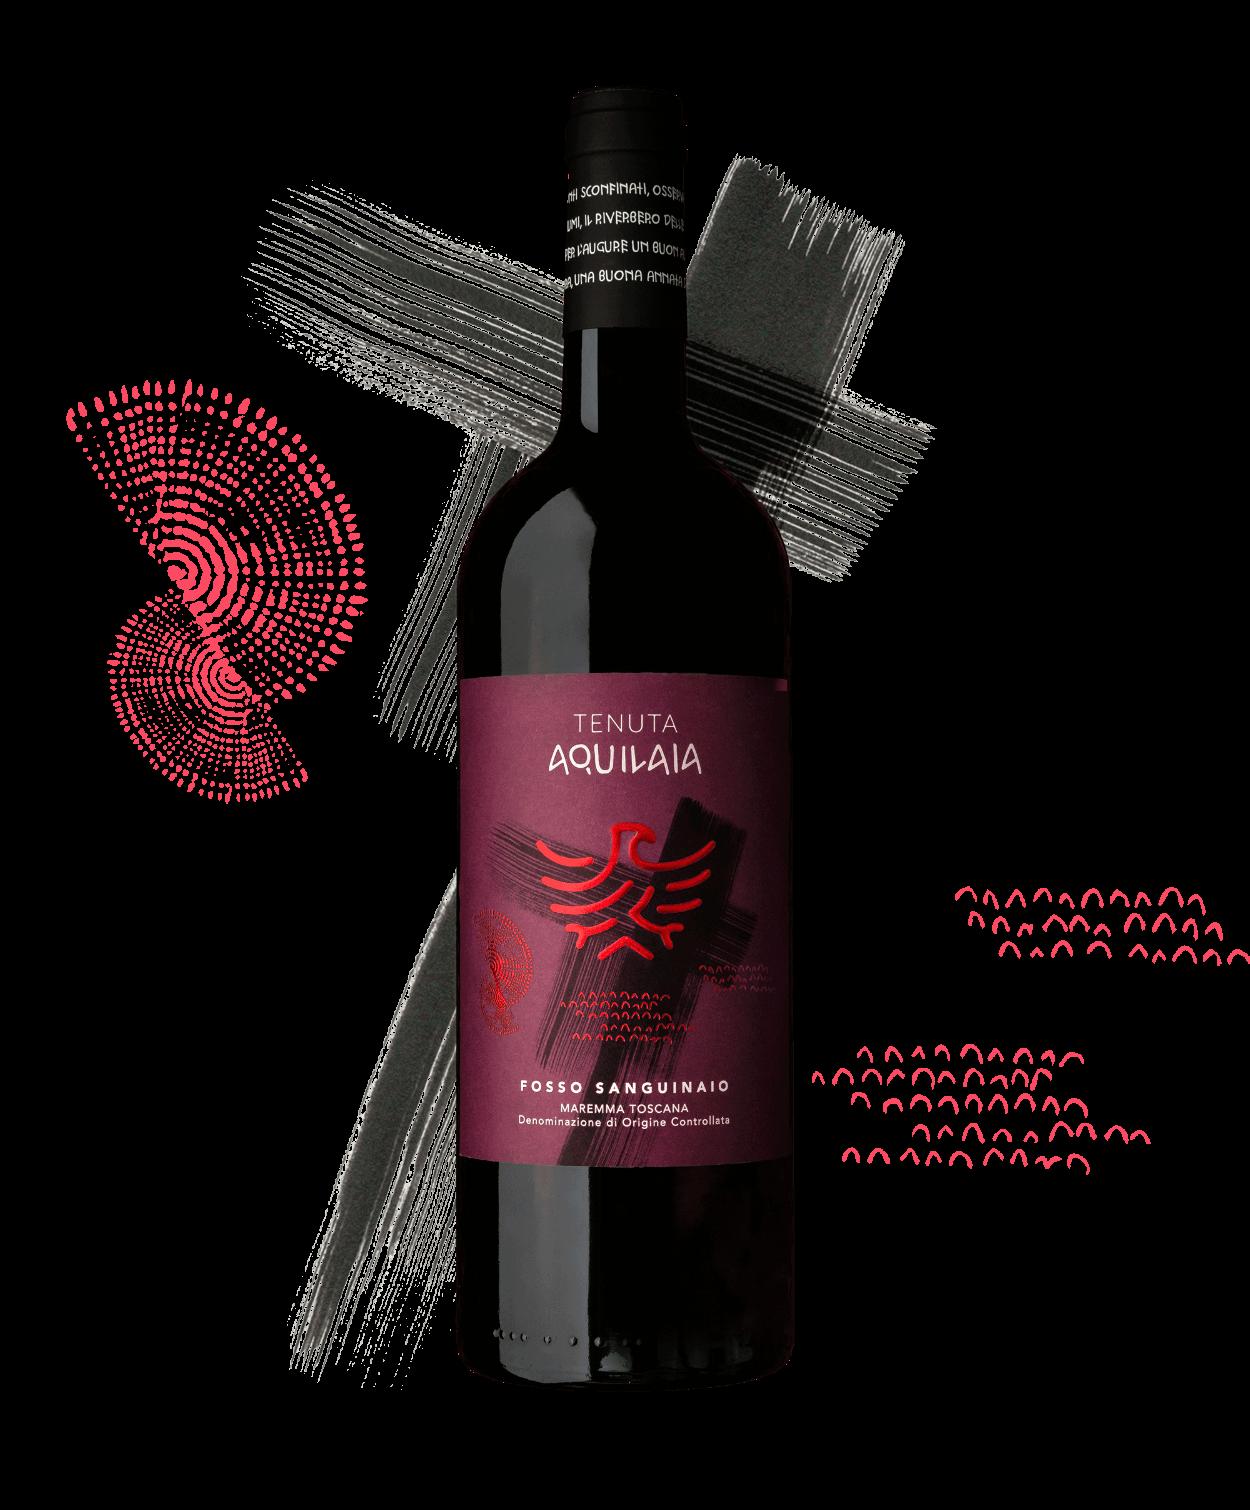 tenuta-aquilaia-auspici-vino-fosso-sanguinaio